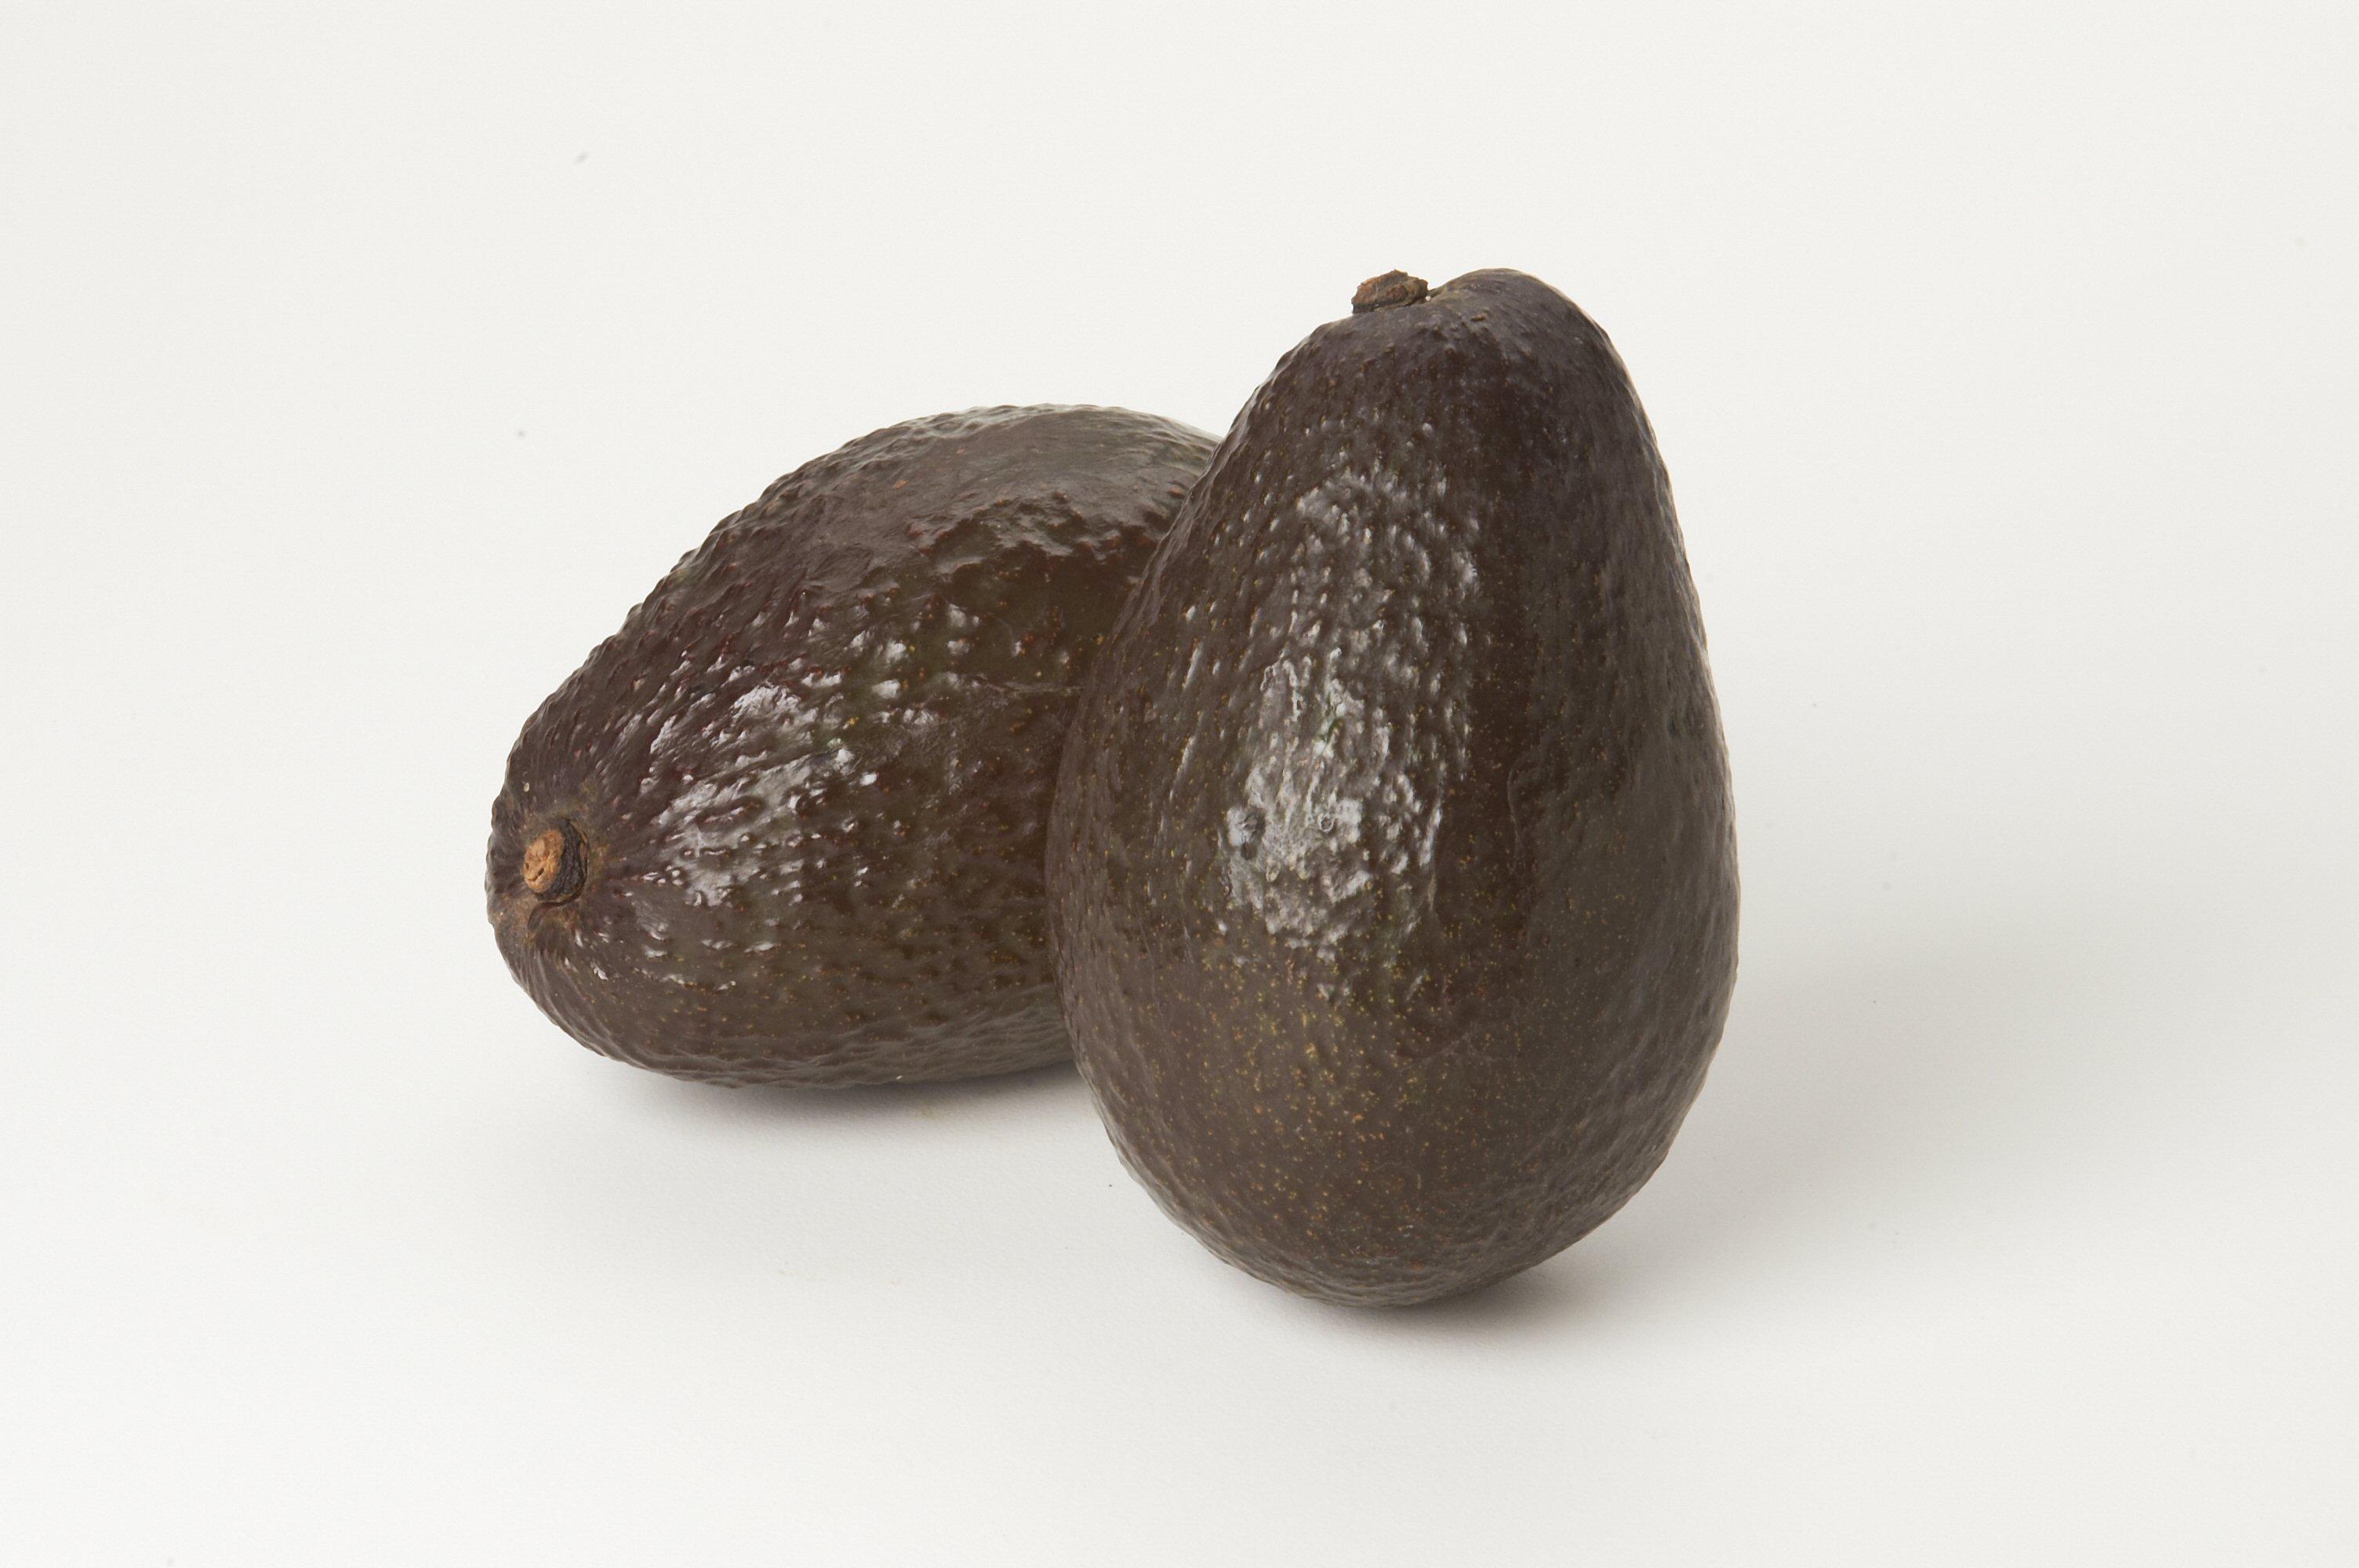 Avocados Haas